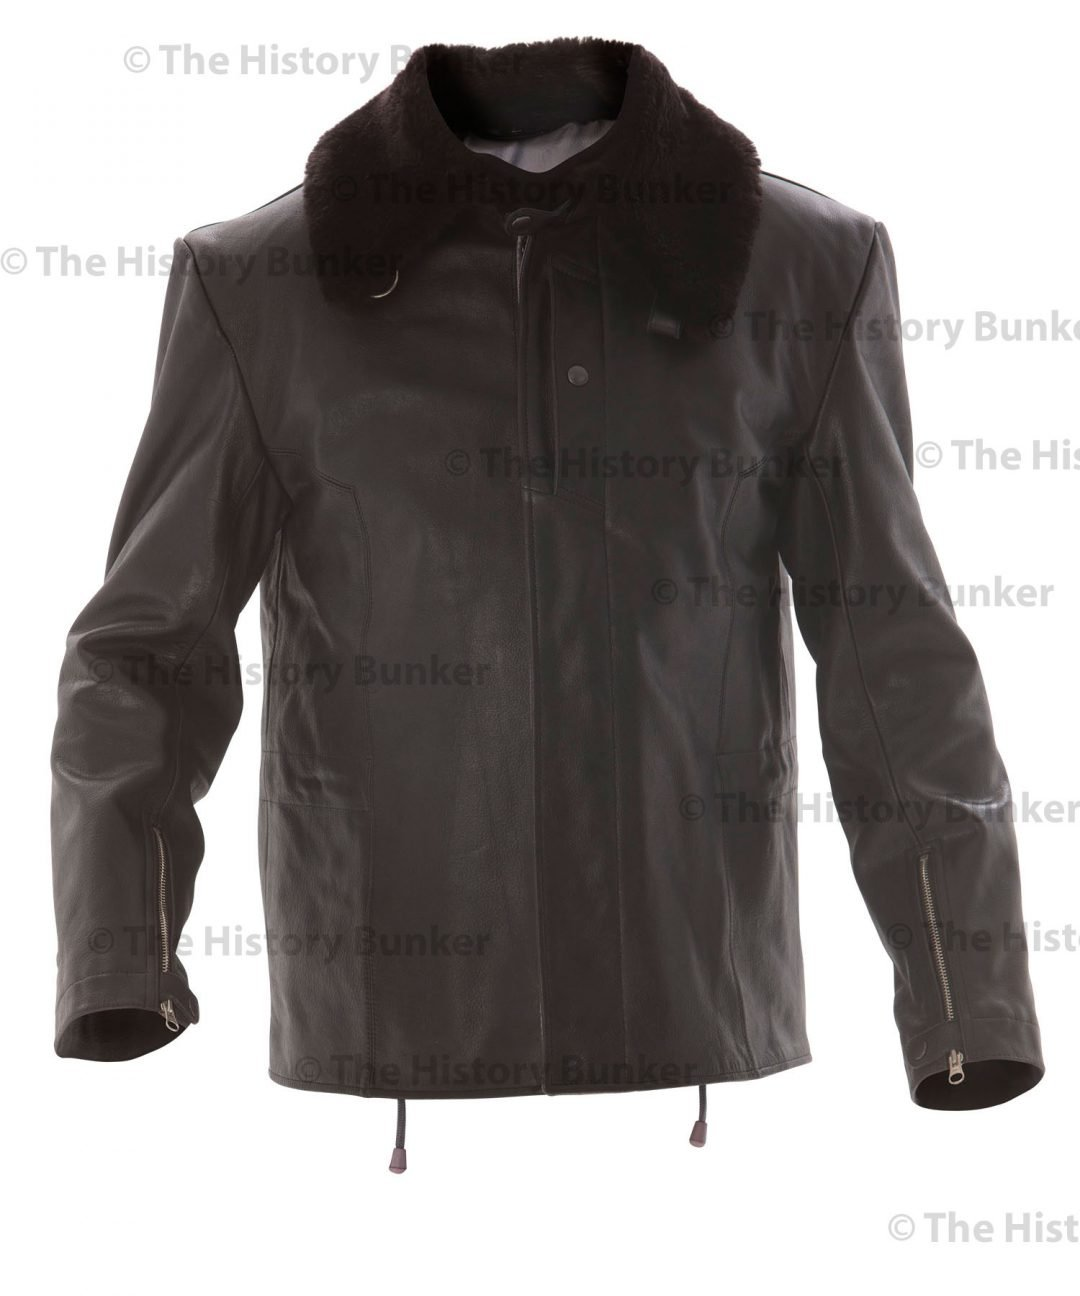 WW2 German Luftwaffe Jet Pilots leather jacket - black